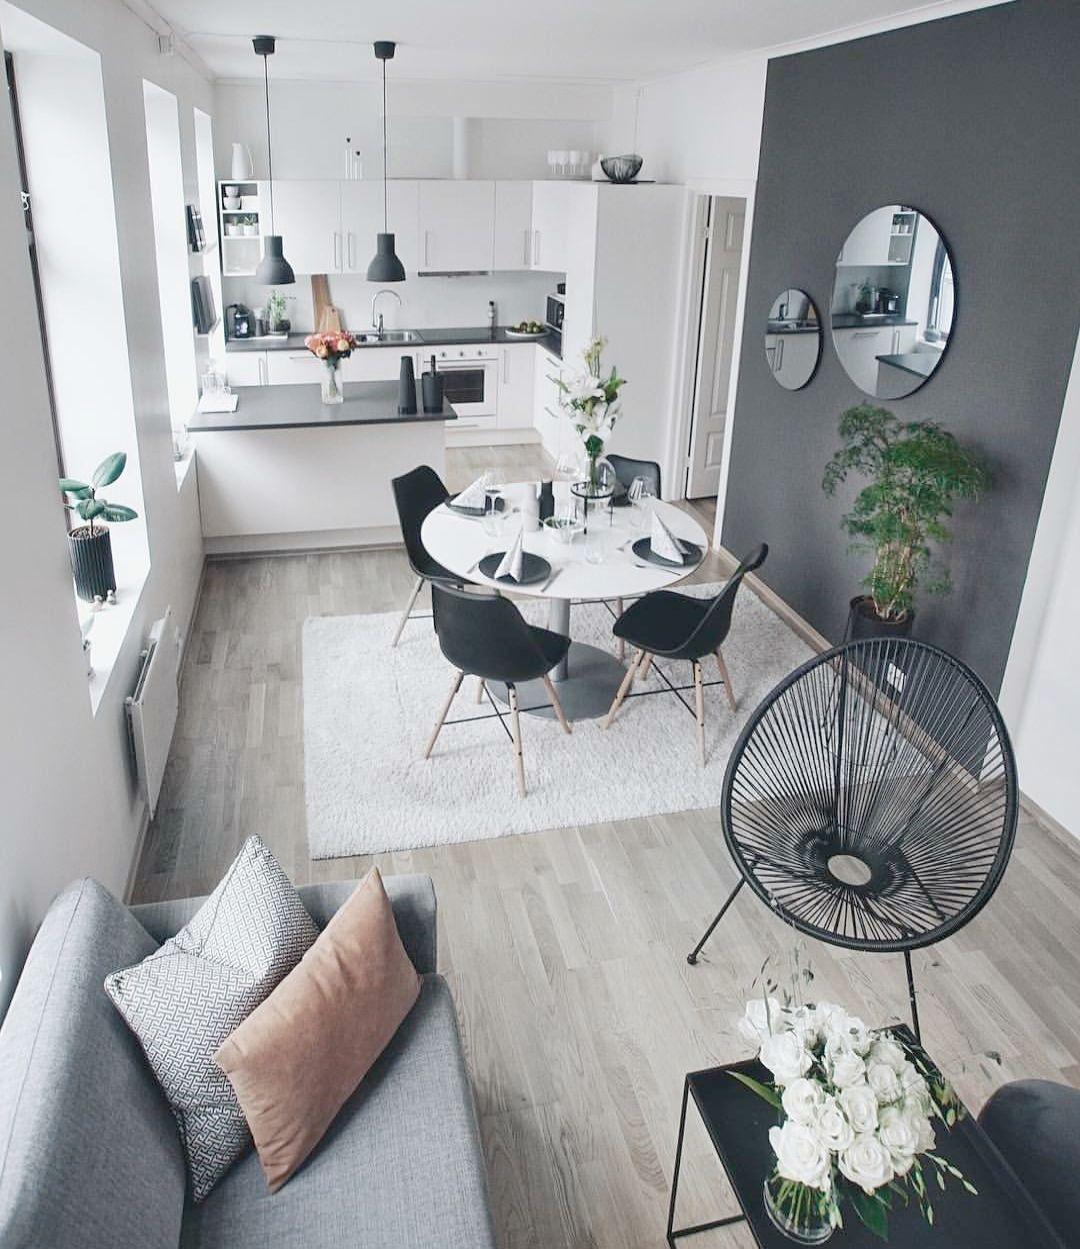 Furniture Shops Online Nz Some Furniture Repair Elmira Ny